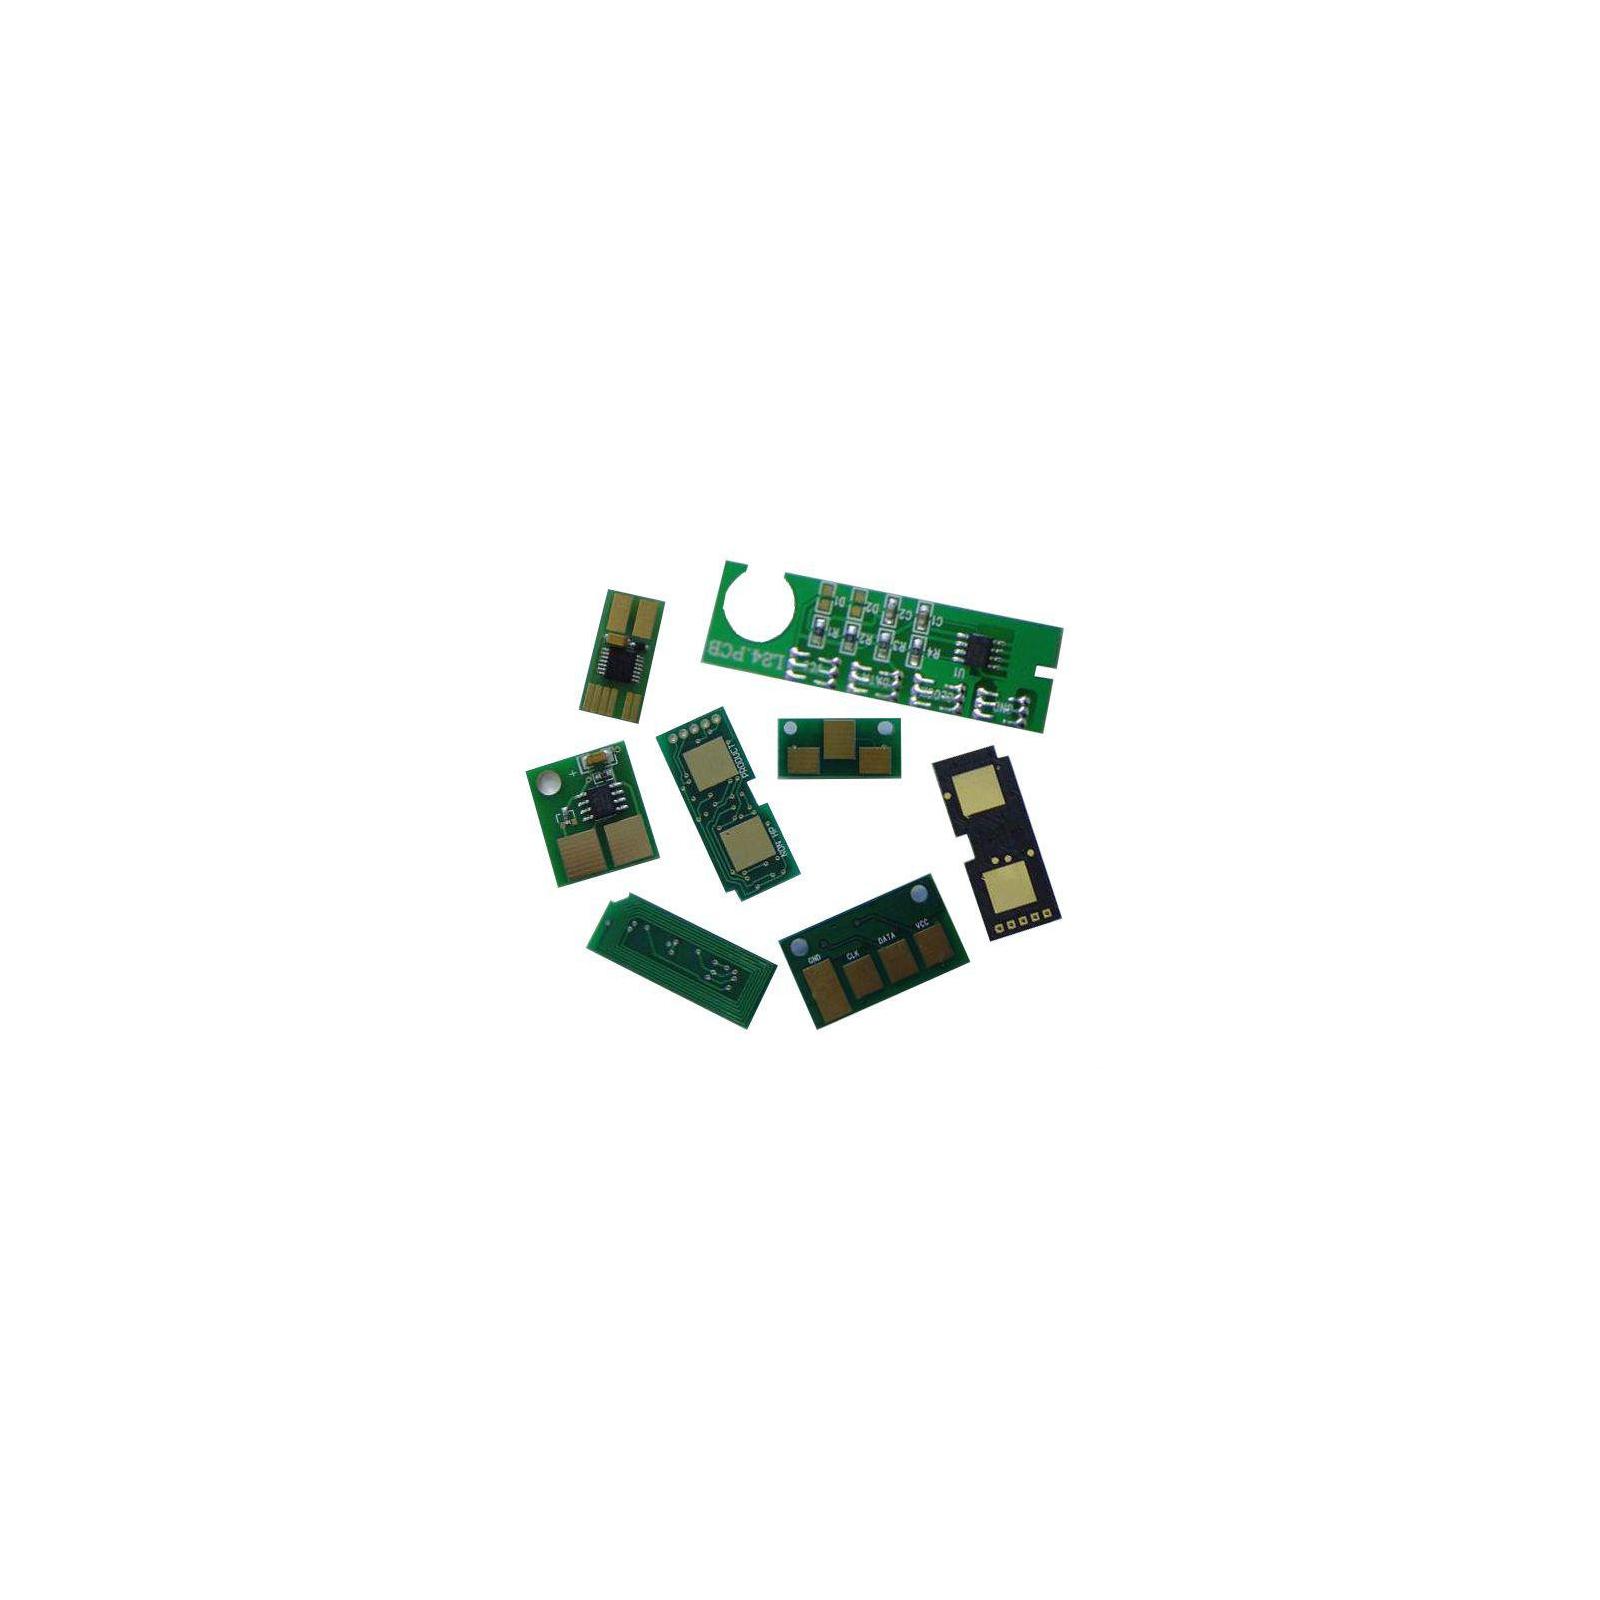 Чип для картриджа EPSON T7024 ДЛЯ WF-4015/4525 YELLOW Apex (CHIP-EPS-T7024-Y)